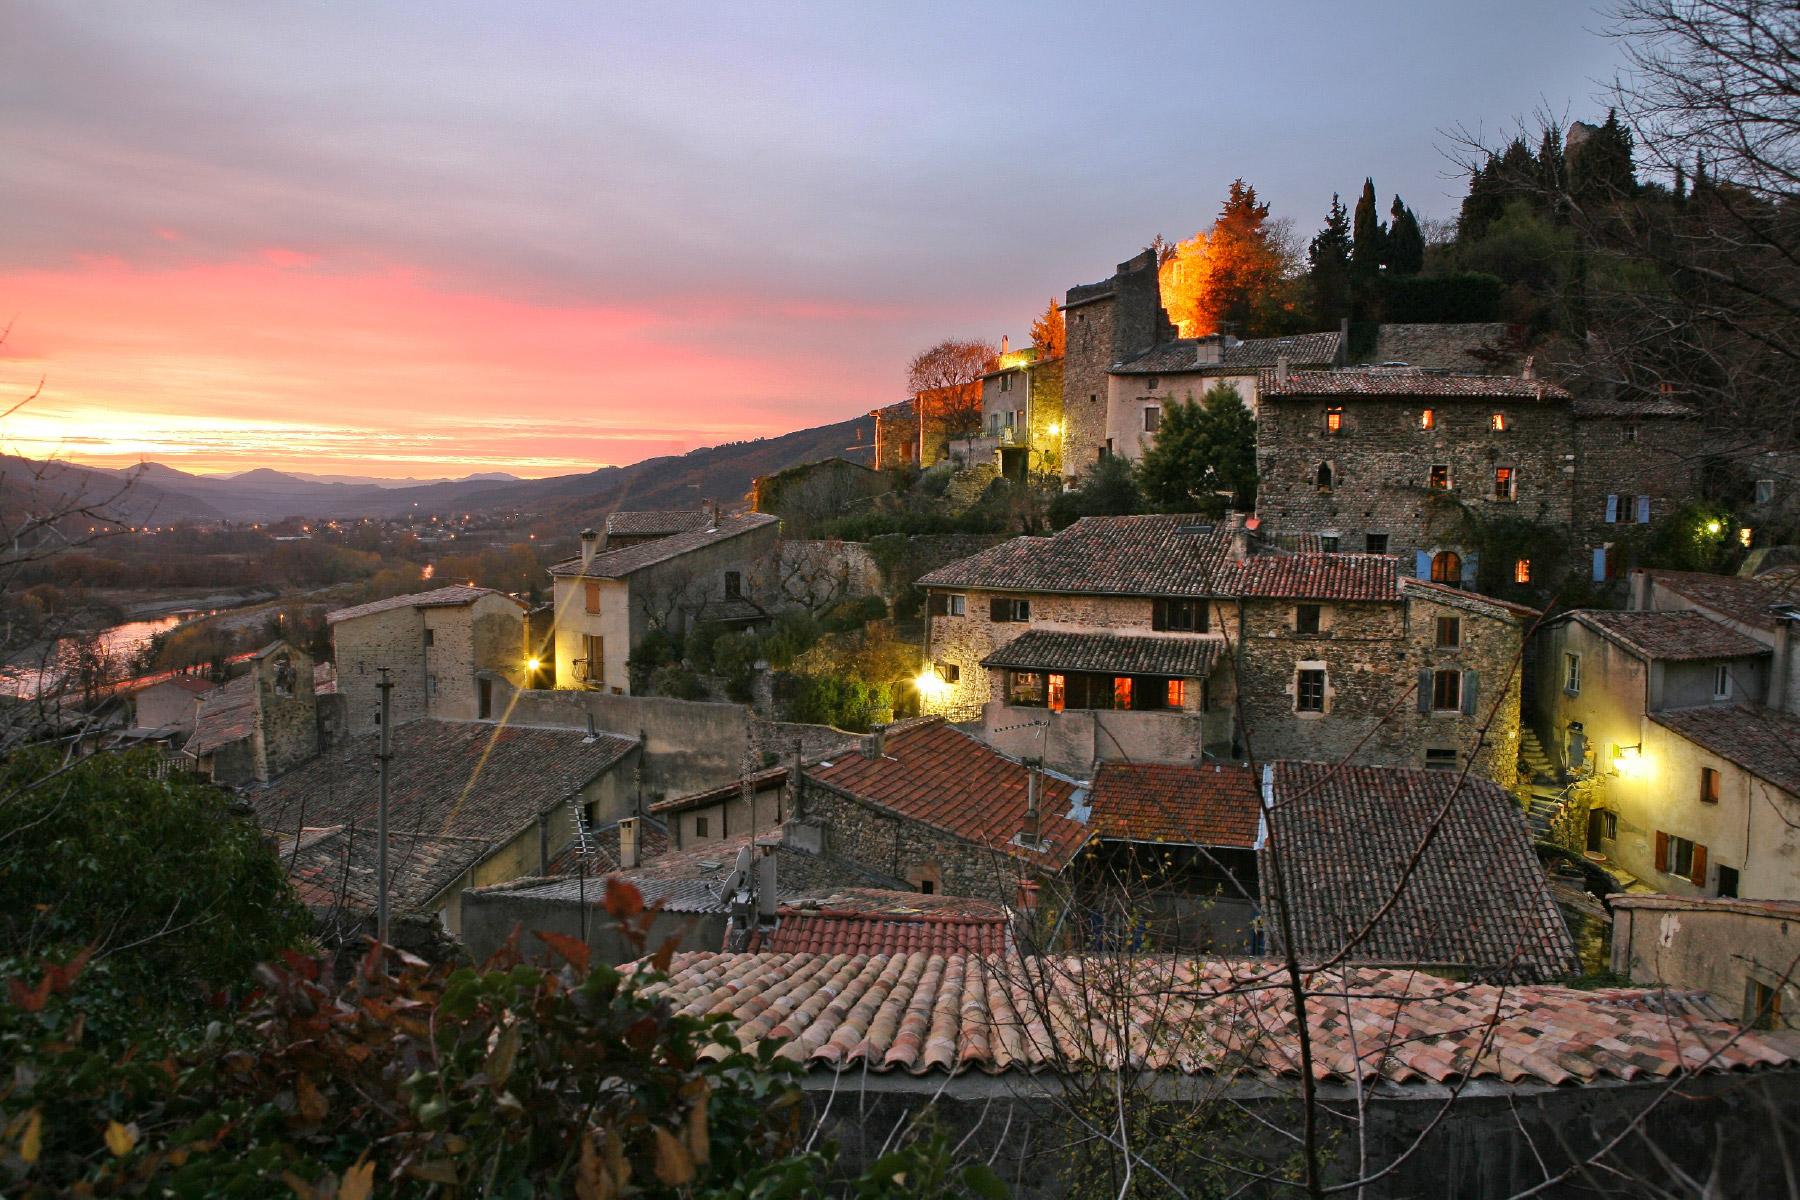 tourisme-coeur-ardeche-village-histoire-tranquilite